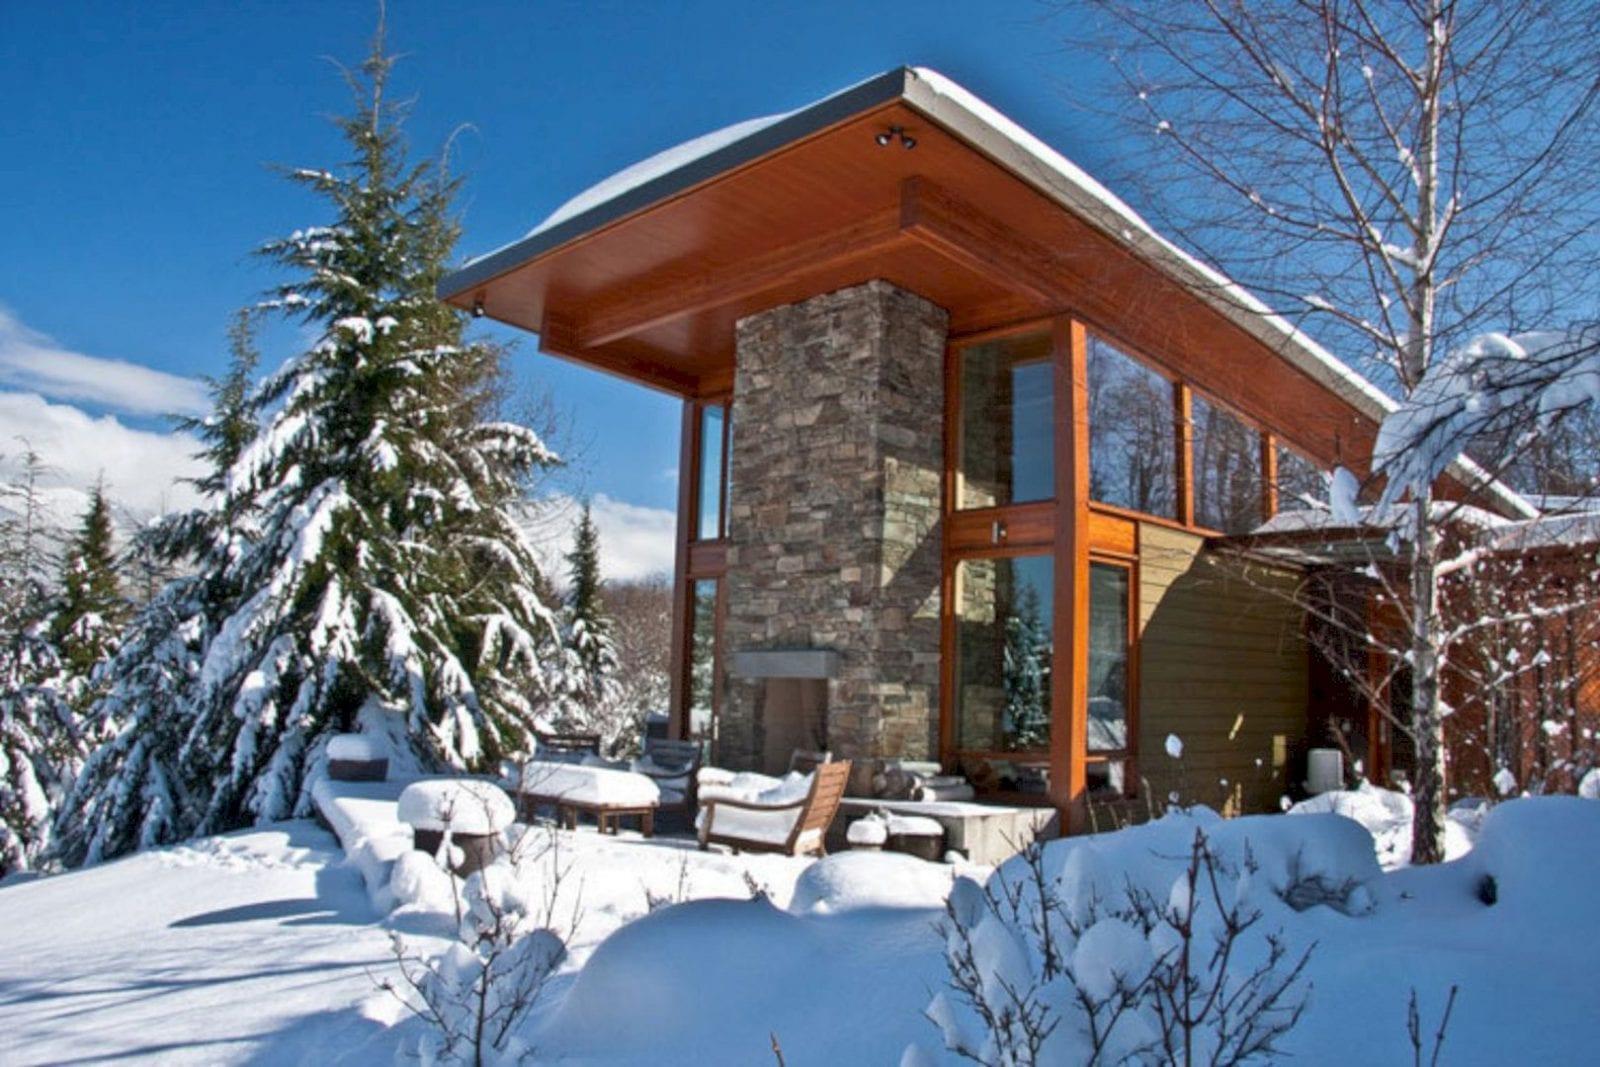 Modern Mountain Cabin North Bend By Prentiss Balance Wickline Architects 3